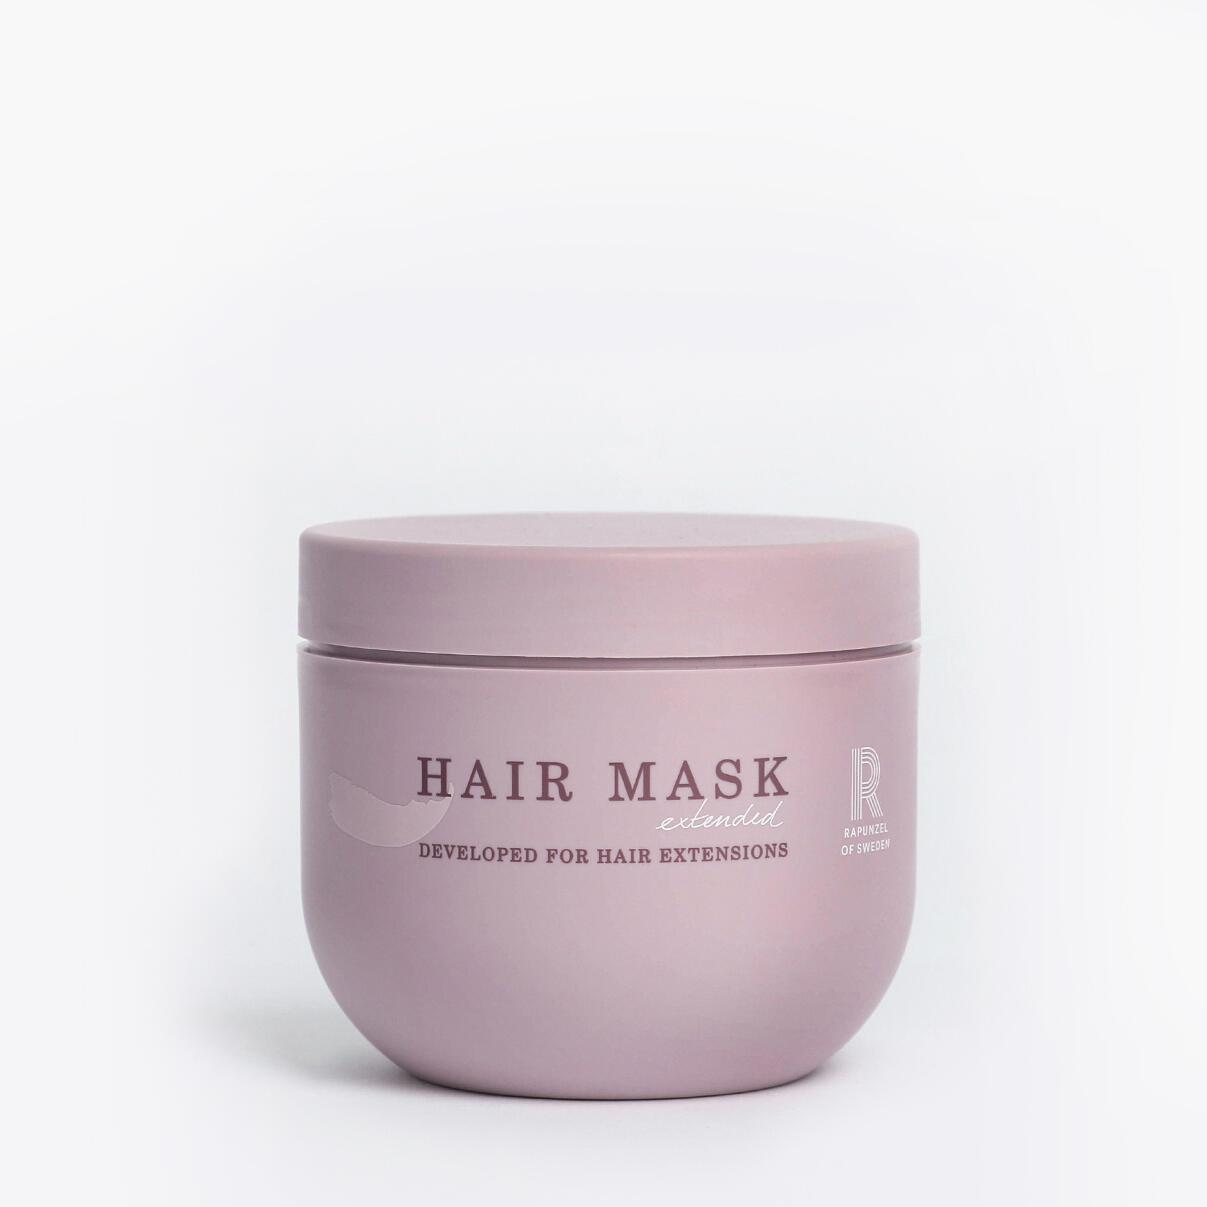 Rapunzel Hair Mask for hair extensions